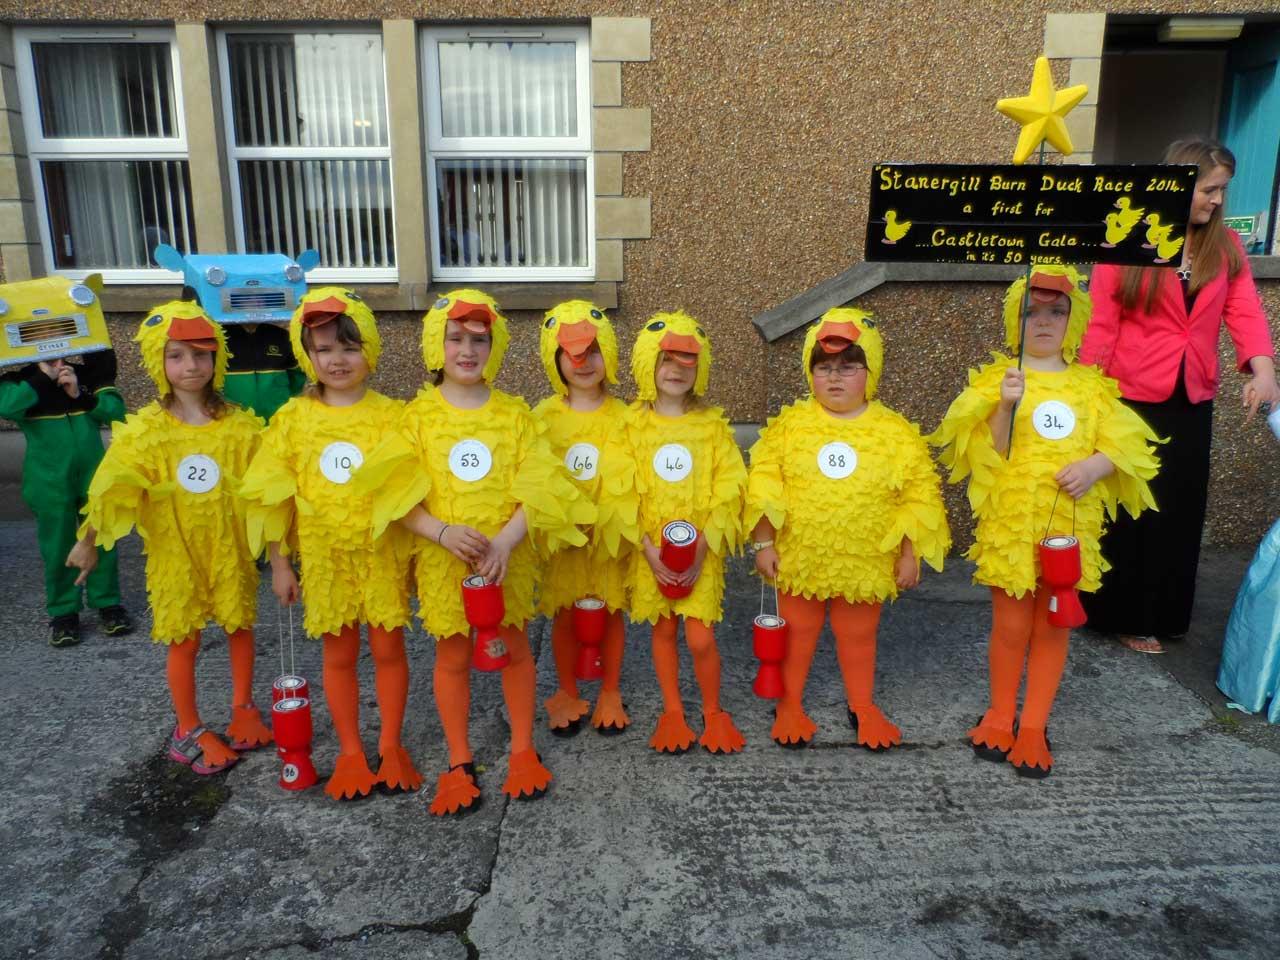 Photo: Castletown Gala 2014